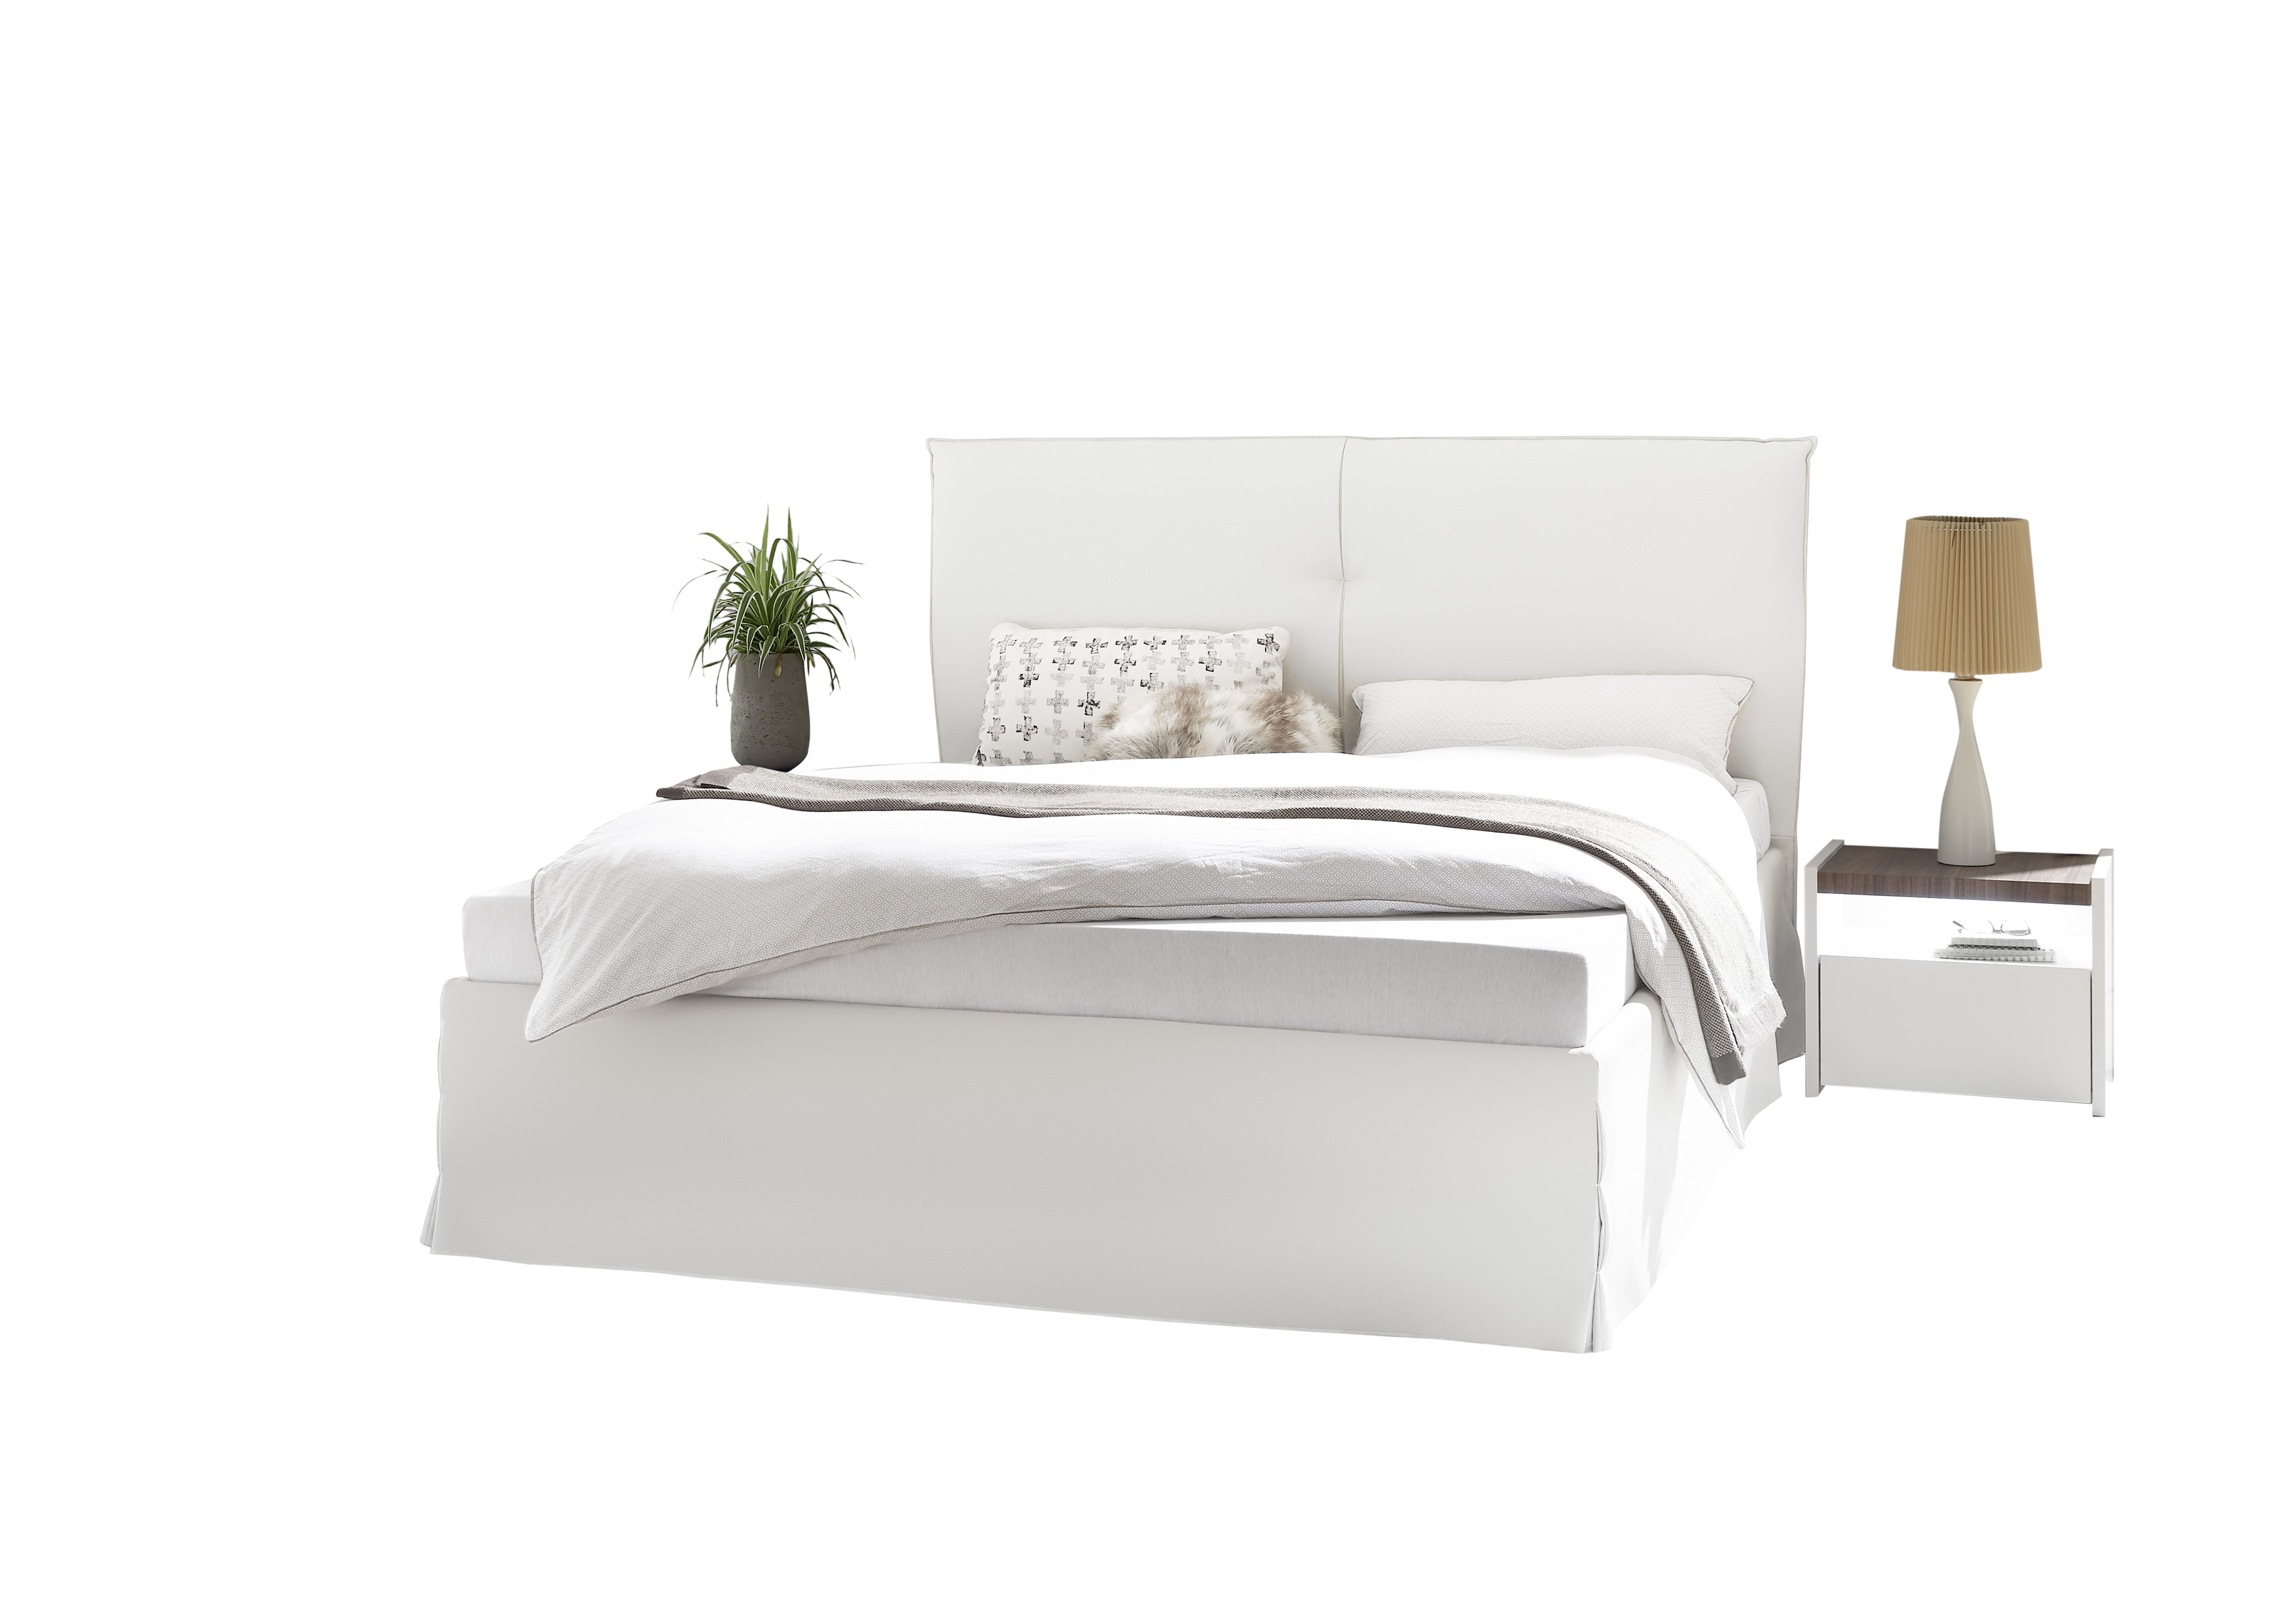 Kunstlederbett in Weiß Luana Mantova 160x200